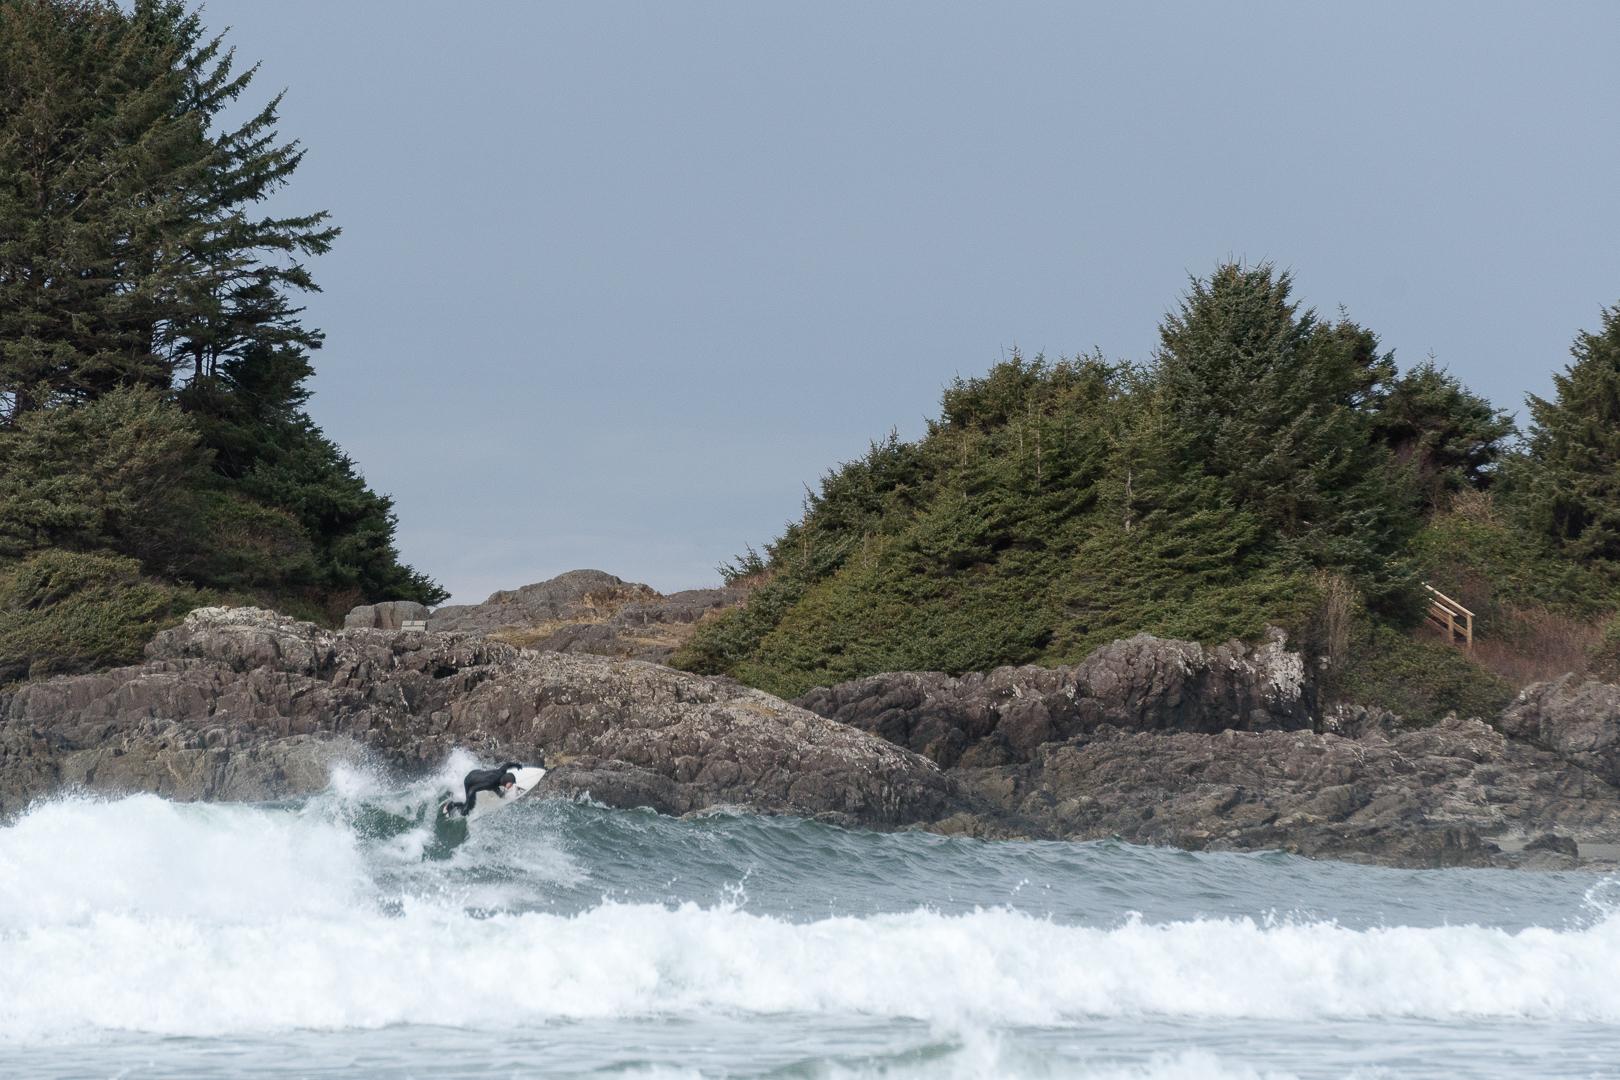 Coldwater surfing, Cox Bay, Tofino, British Columbia